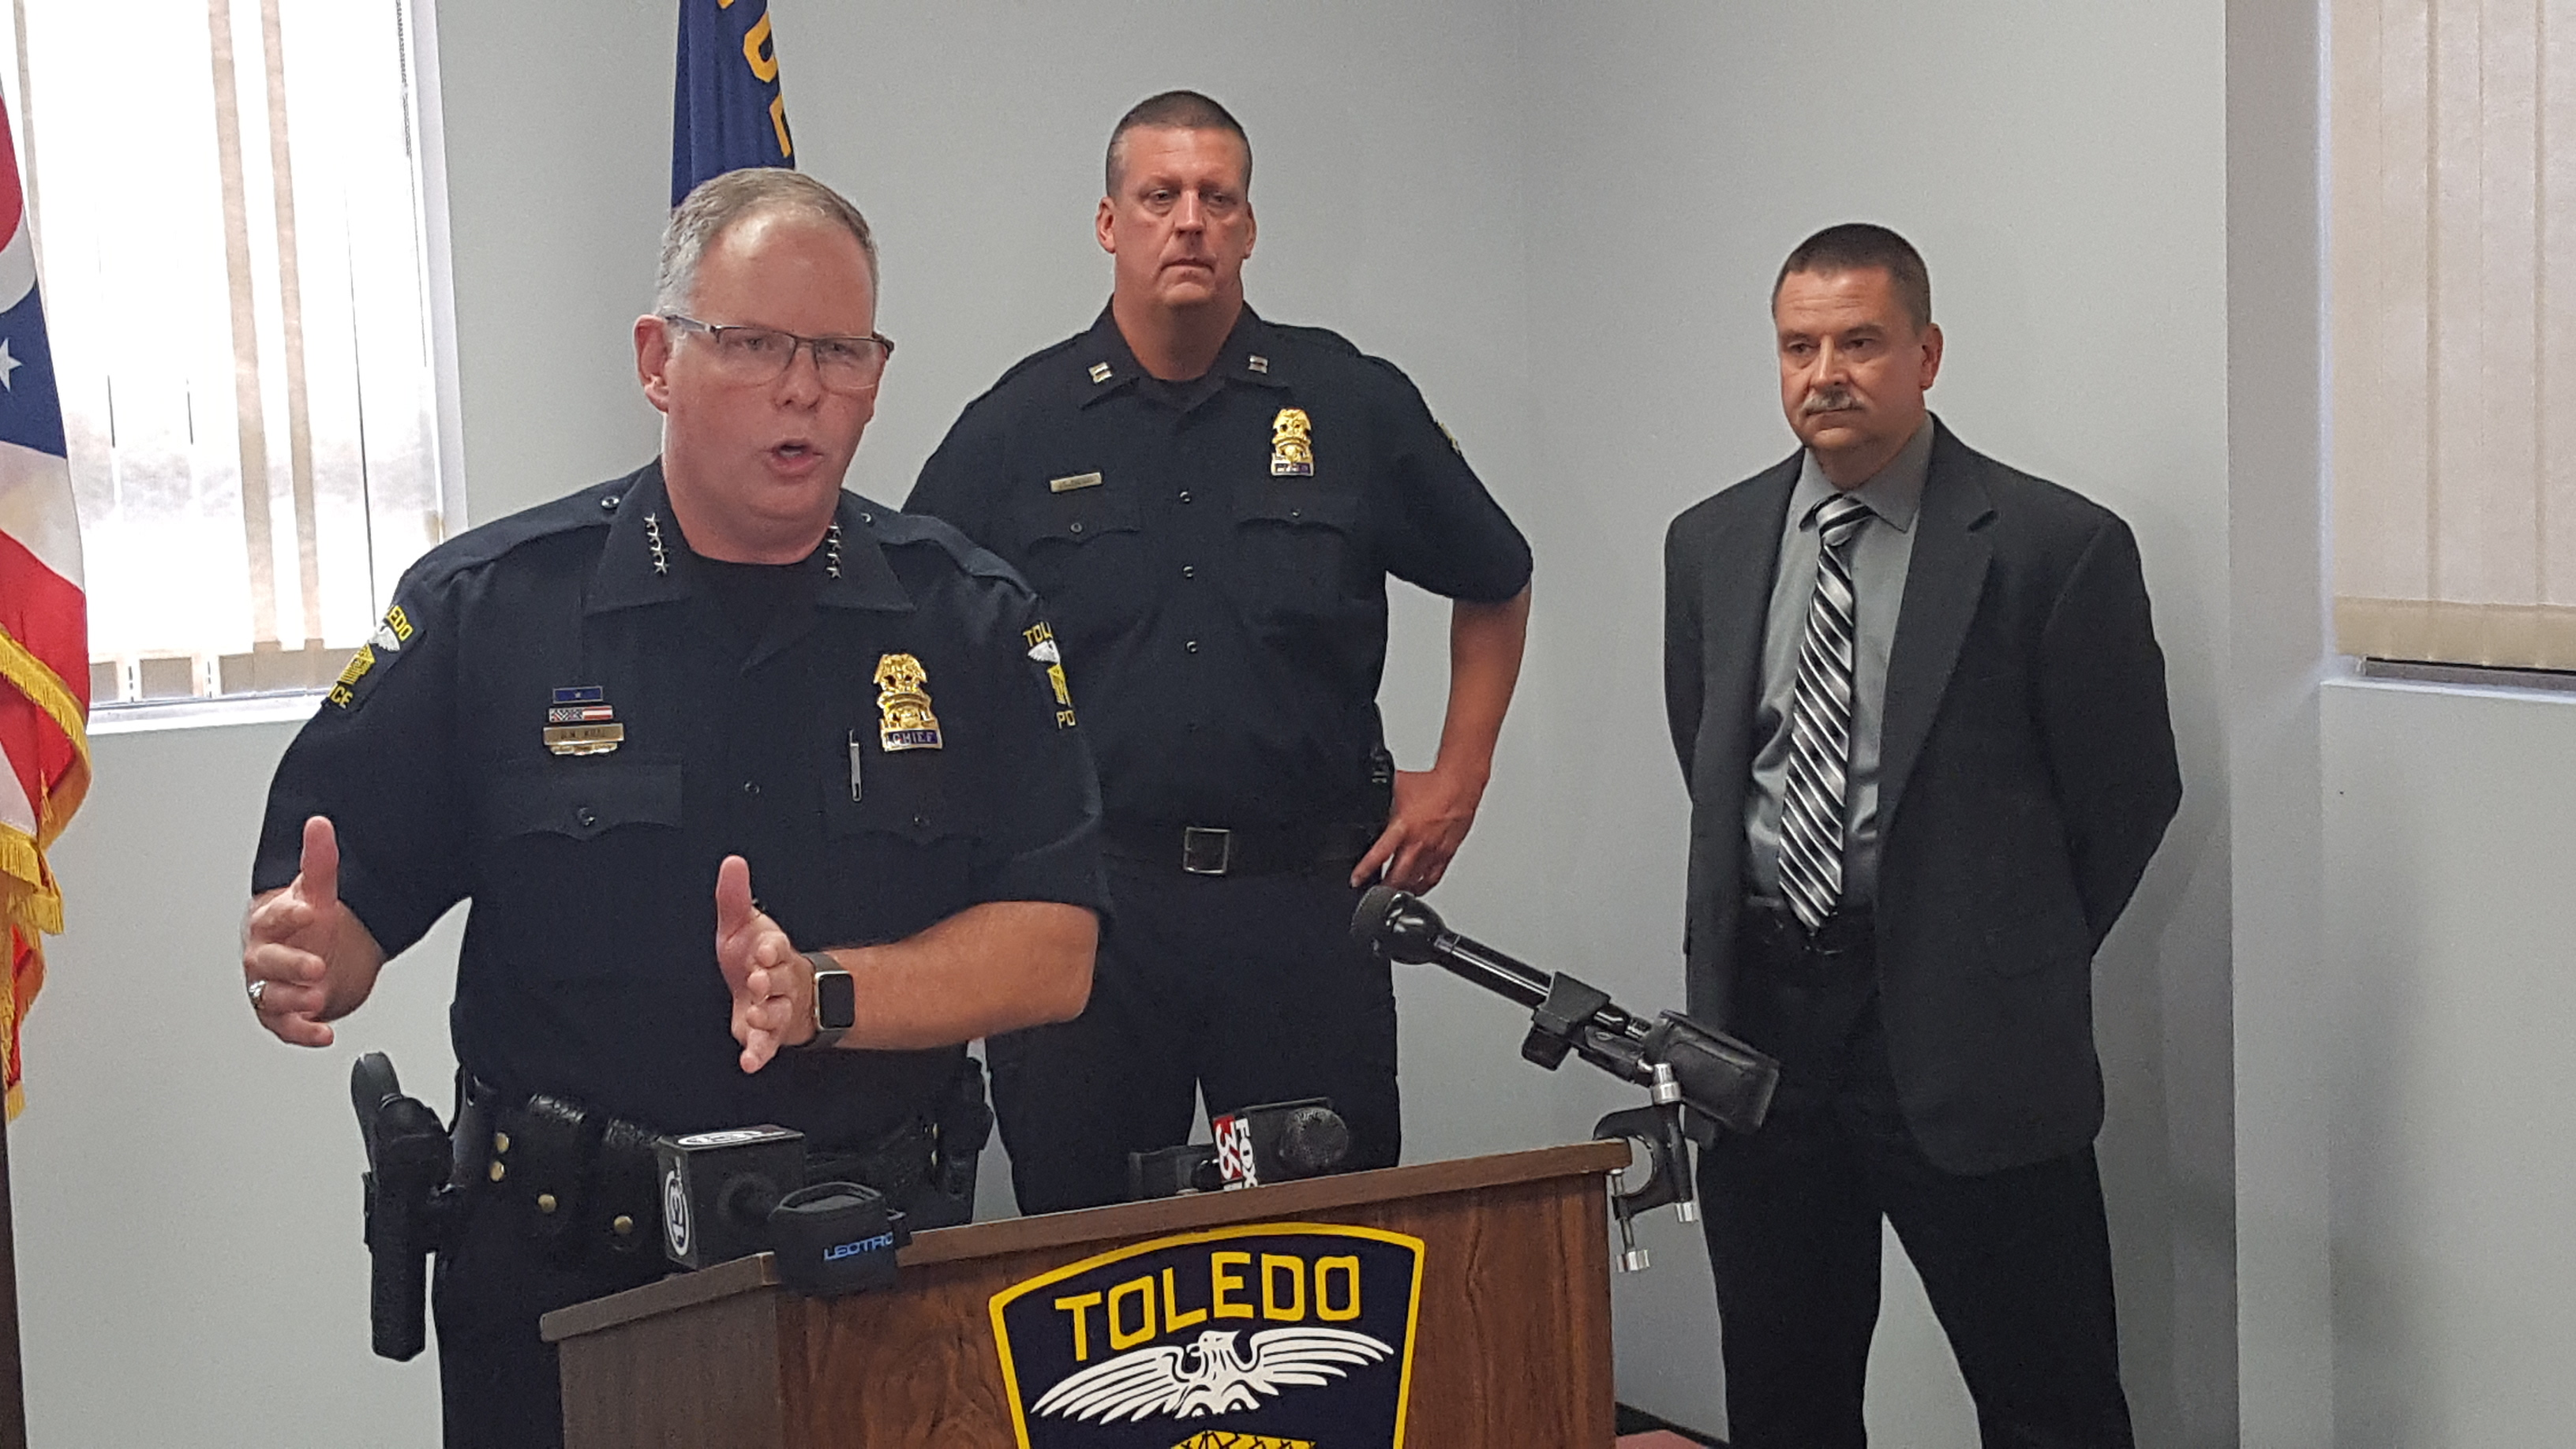 a police officer responding to a domestic violence scenario